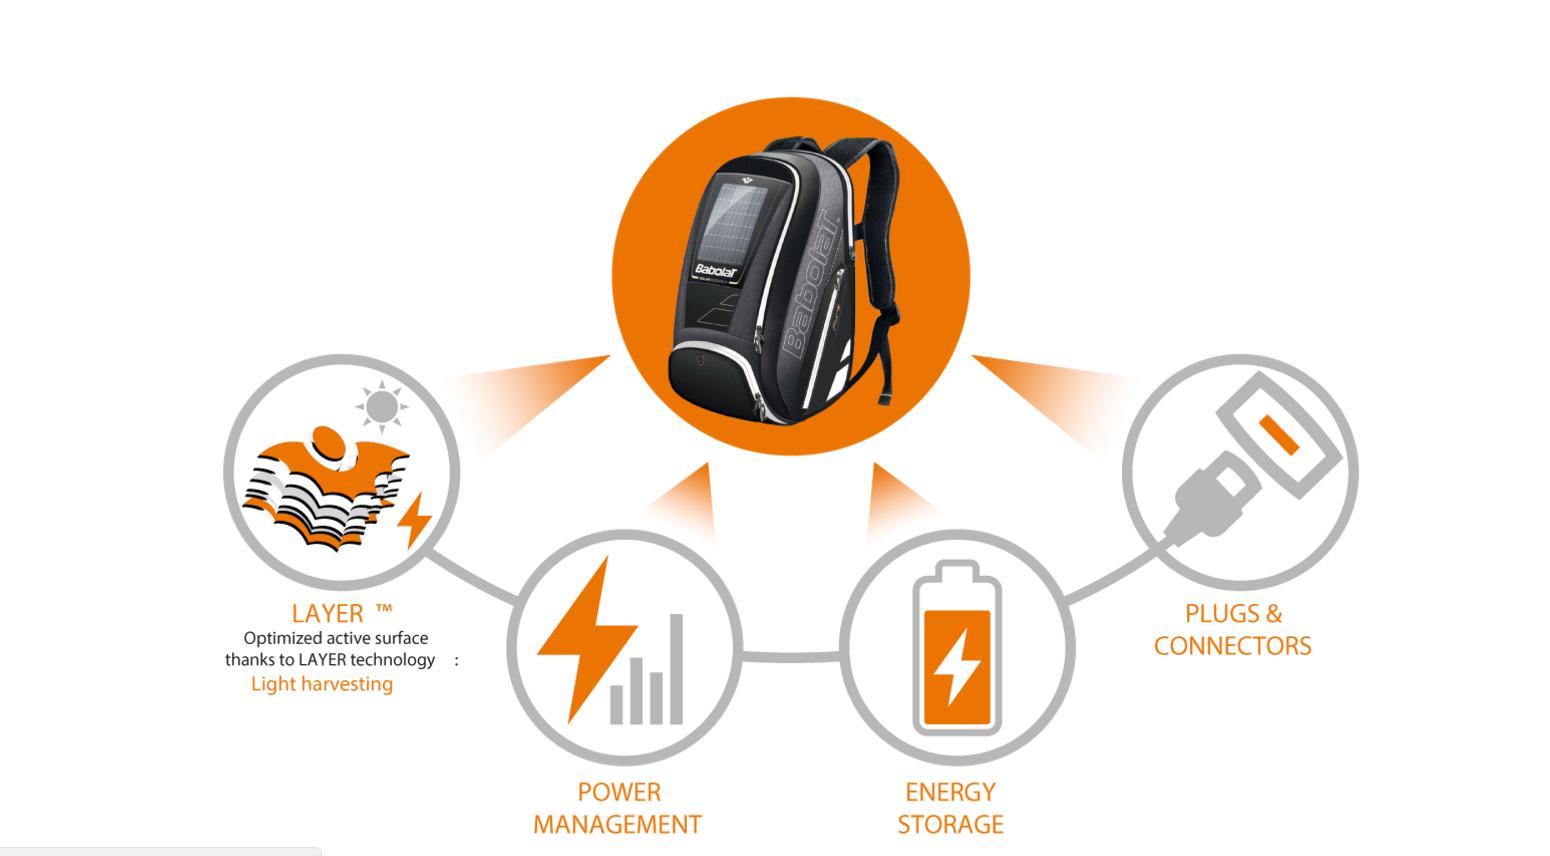 Dracula Technologies研发光能充电材料人造光也可被利用 清洁能源 第2张-泥人传说